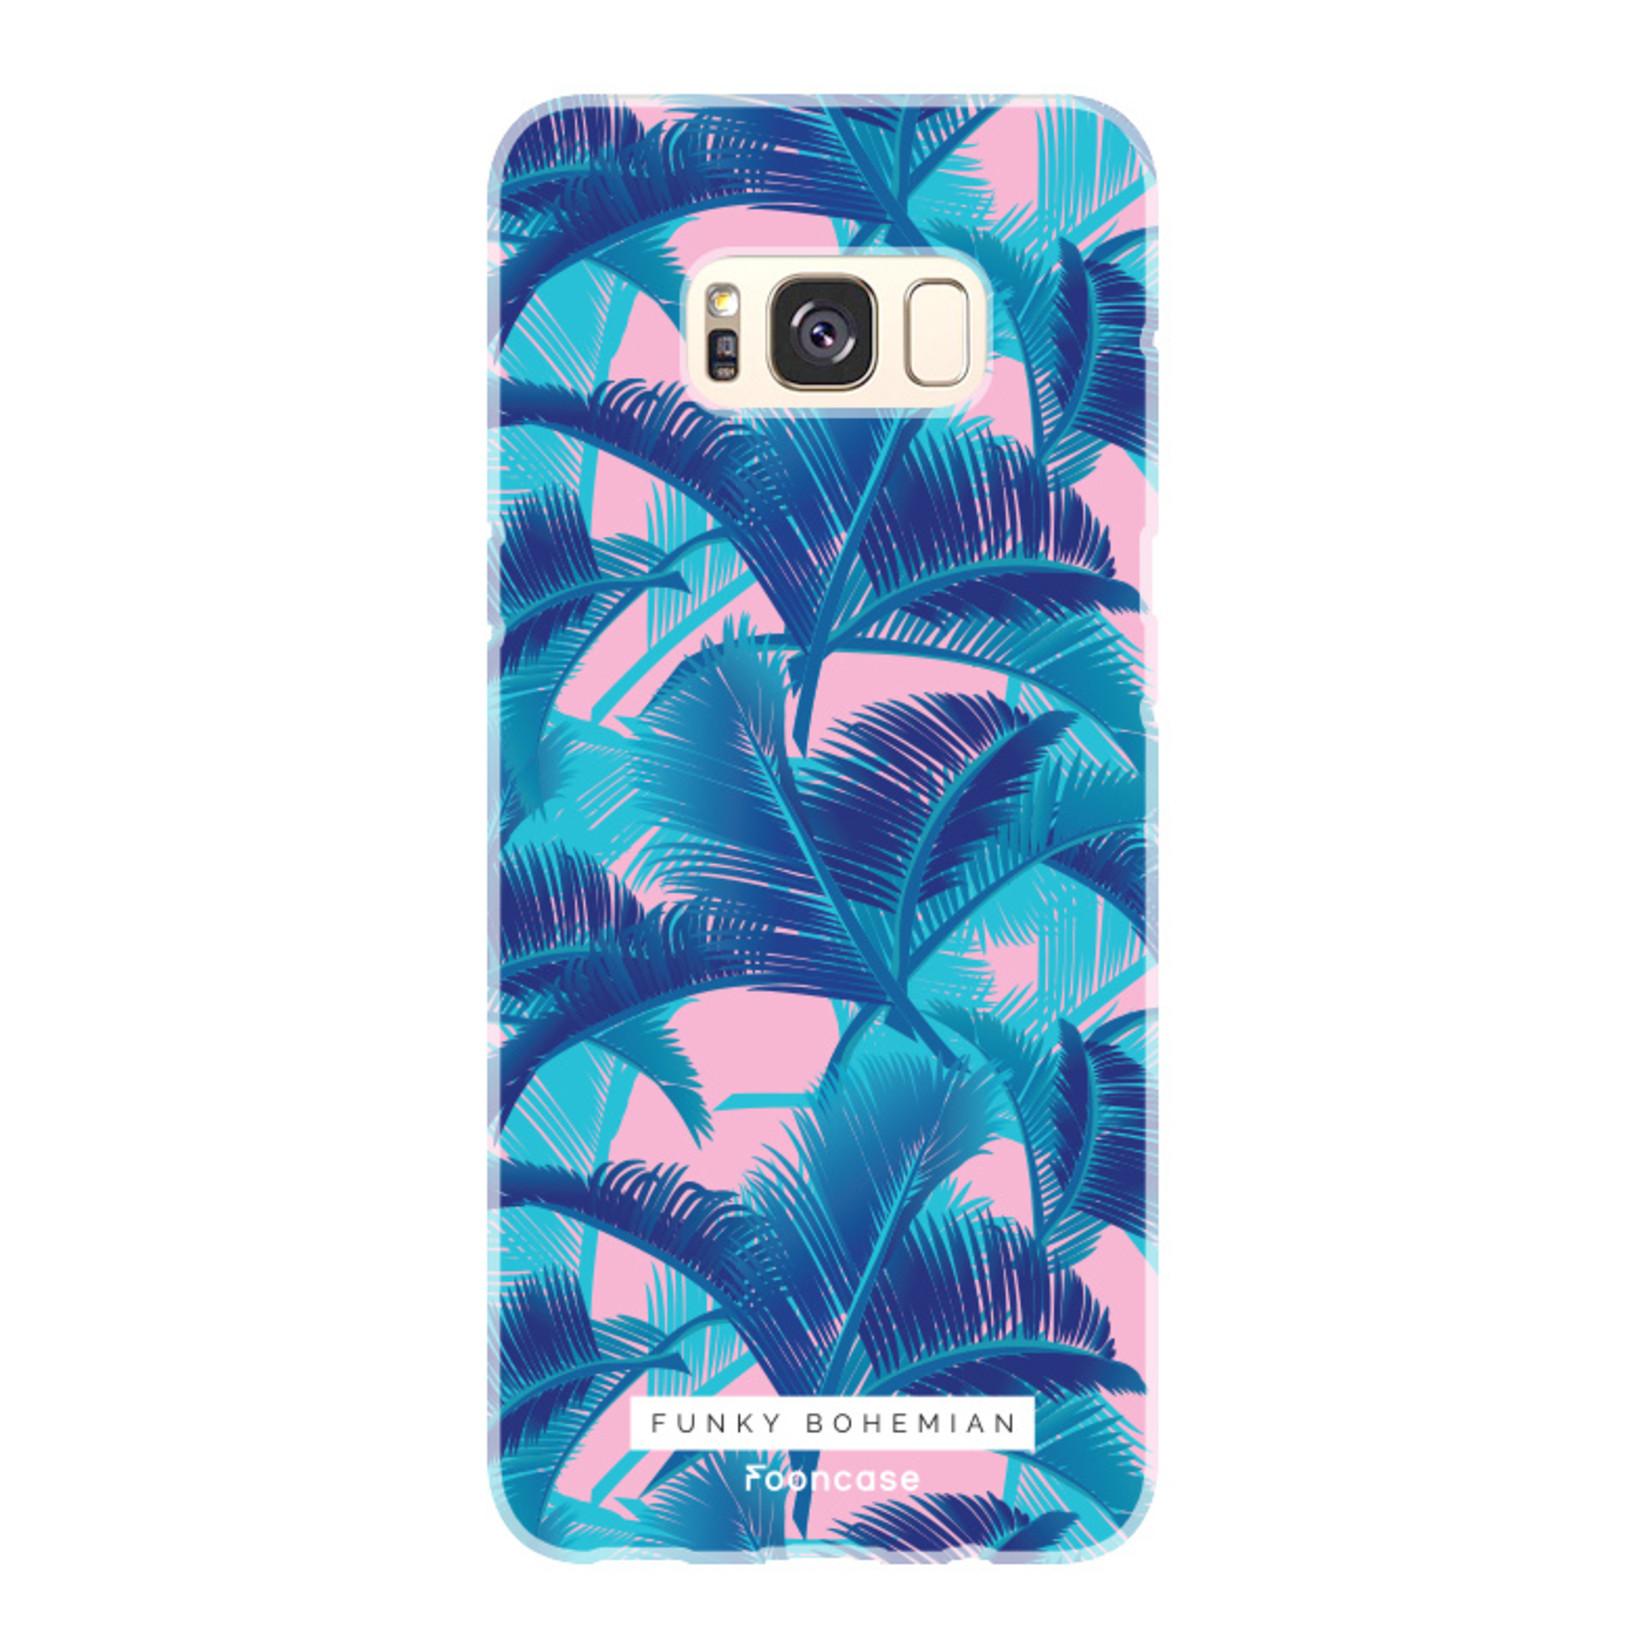 FOONCASE Samsung Galaxy S8 Plus hoesje TPU Soft Case - Back Cover - Funky Bohemian / Blauw Roze Bladeren